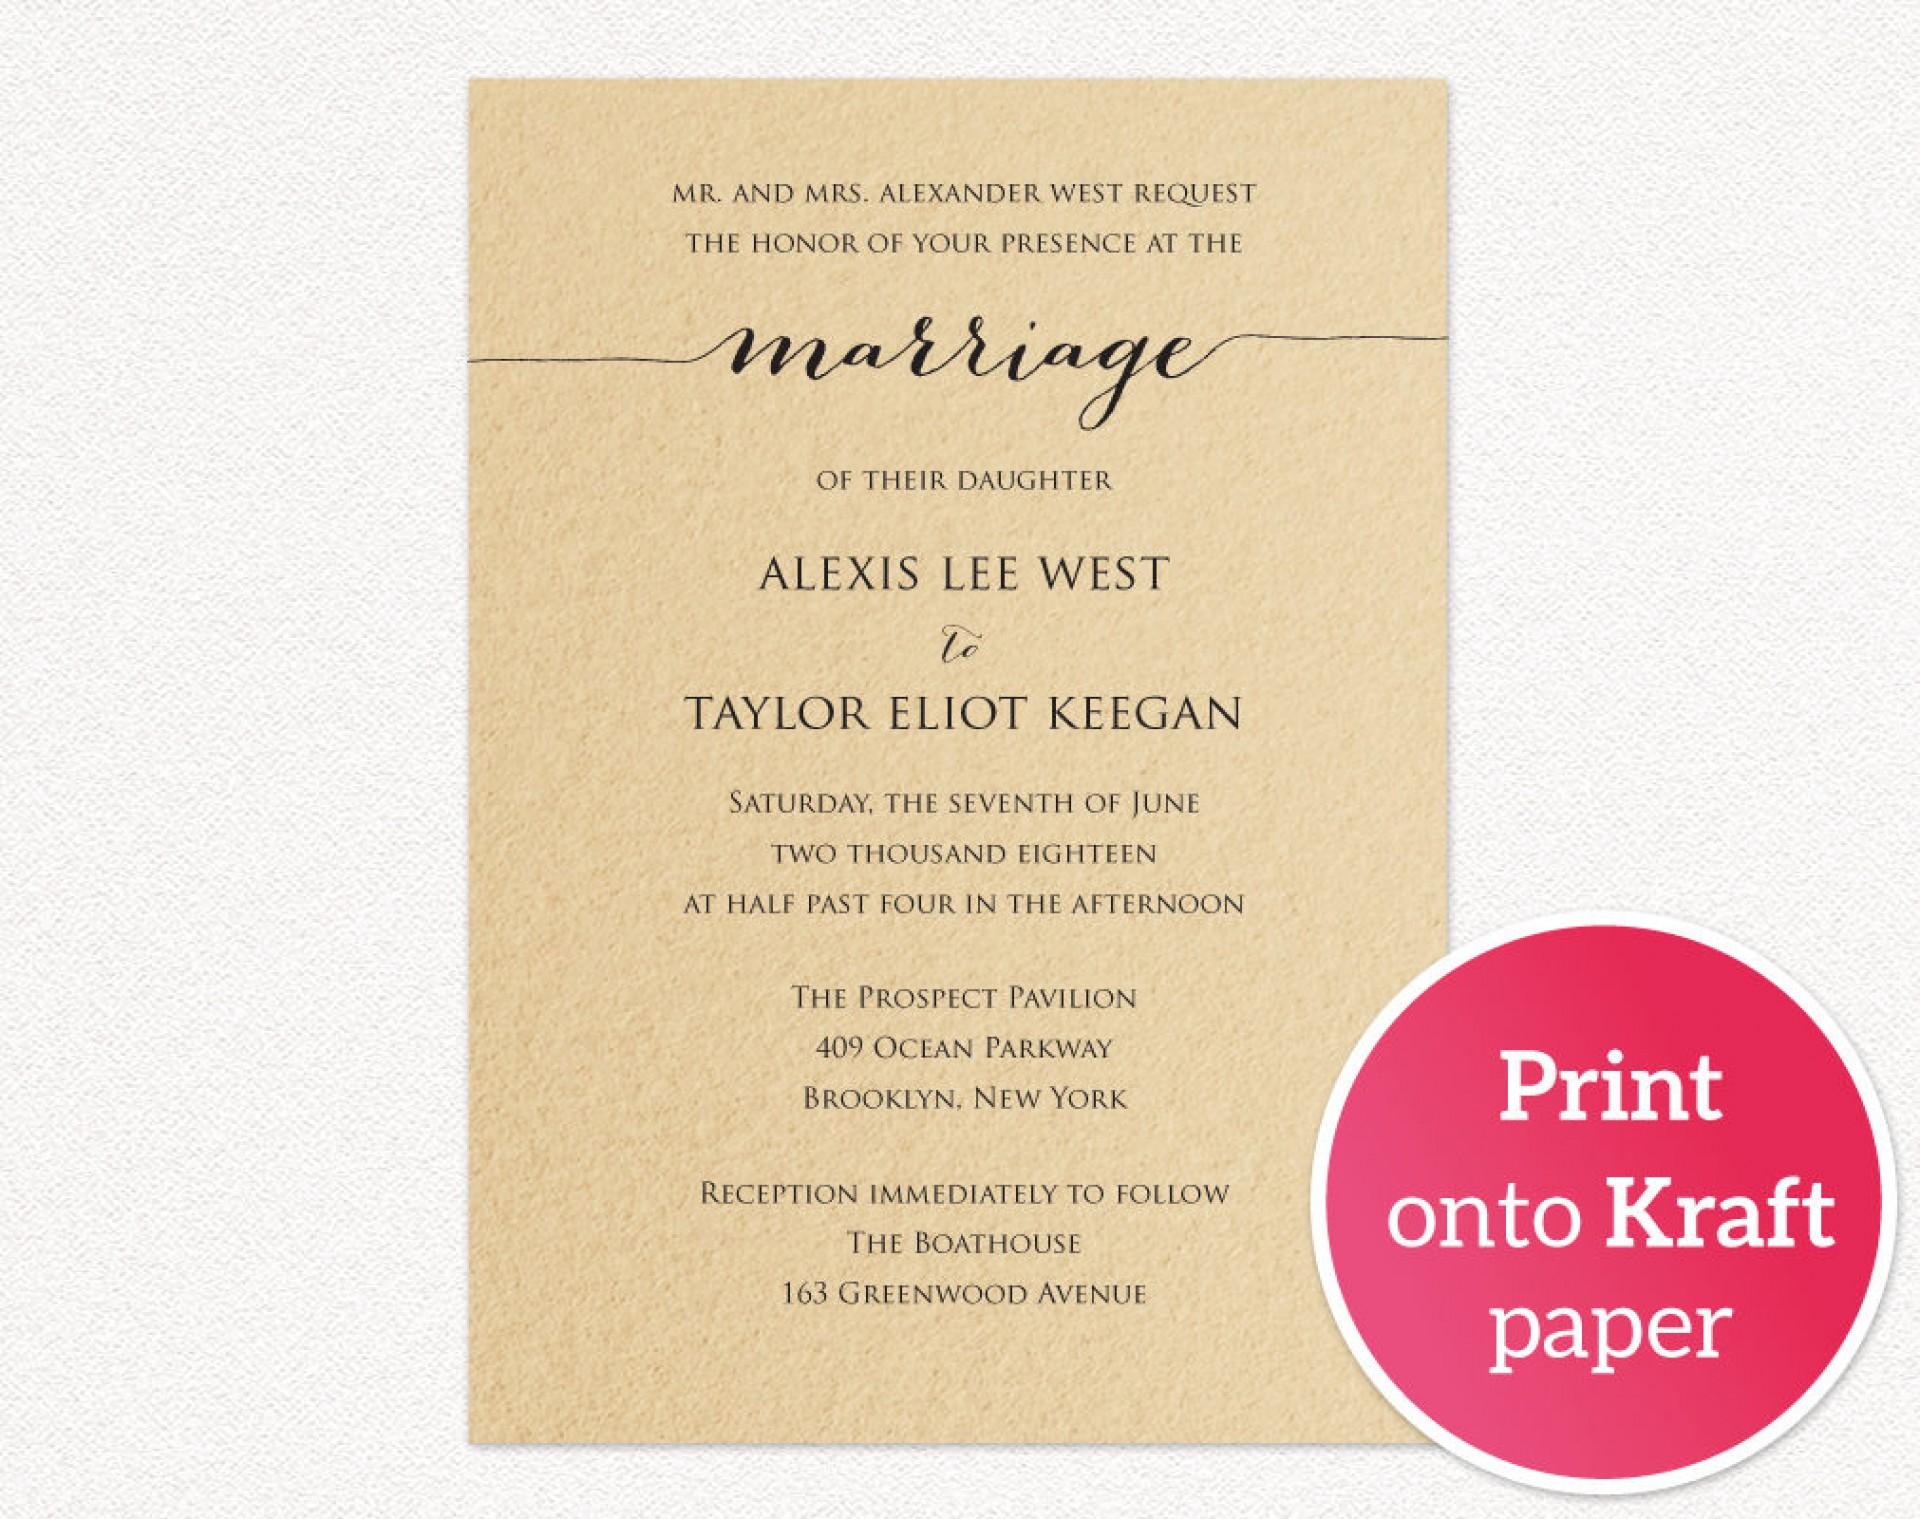 008 Astounding Printable Wedding Invitation Template Example  Free For Microsoft Word Vintage1920